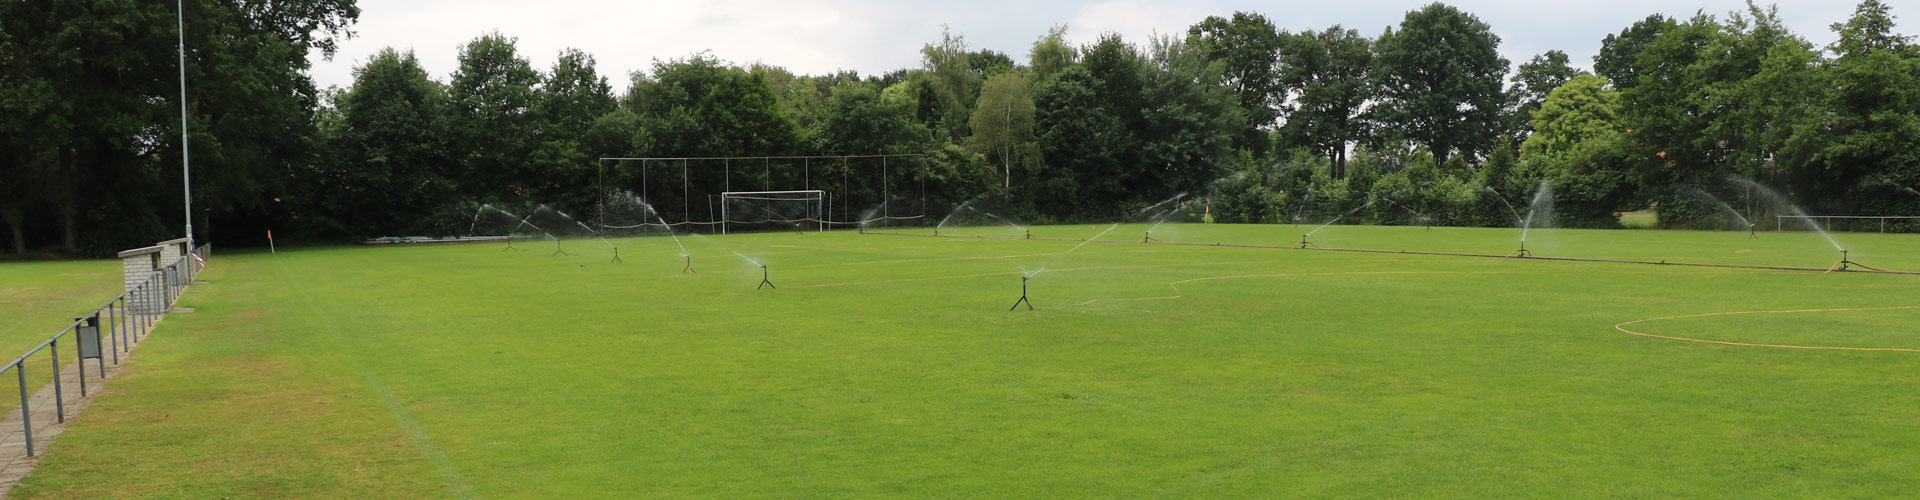 Dorpsaccommodatie Rietmolen - Voetbal veld 2